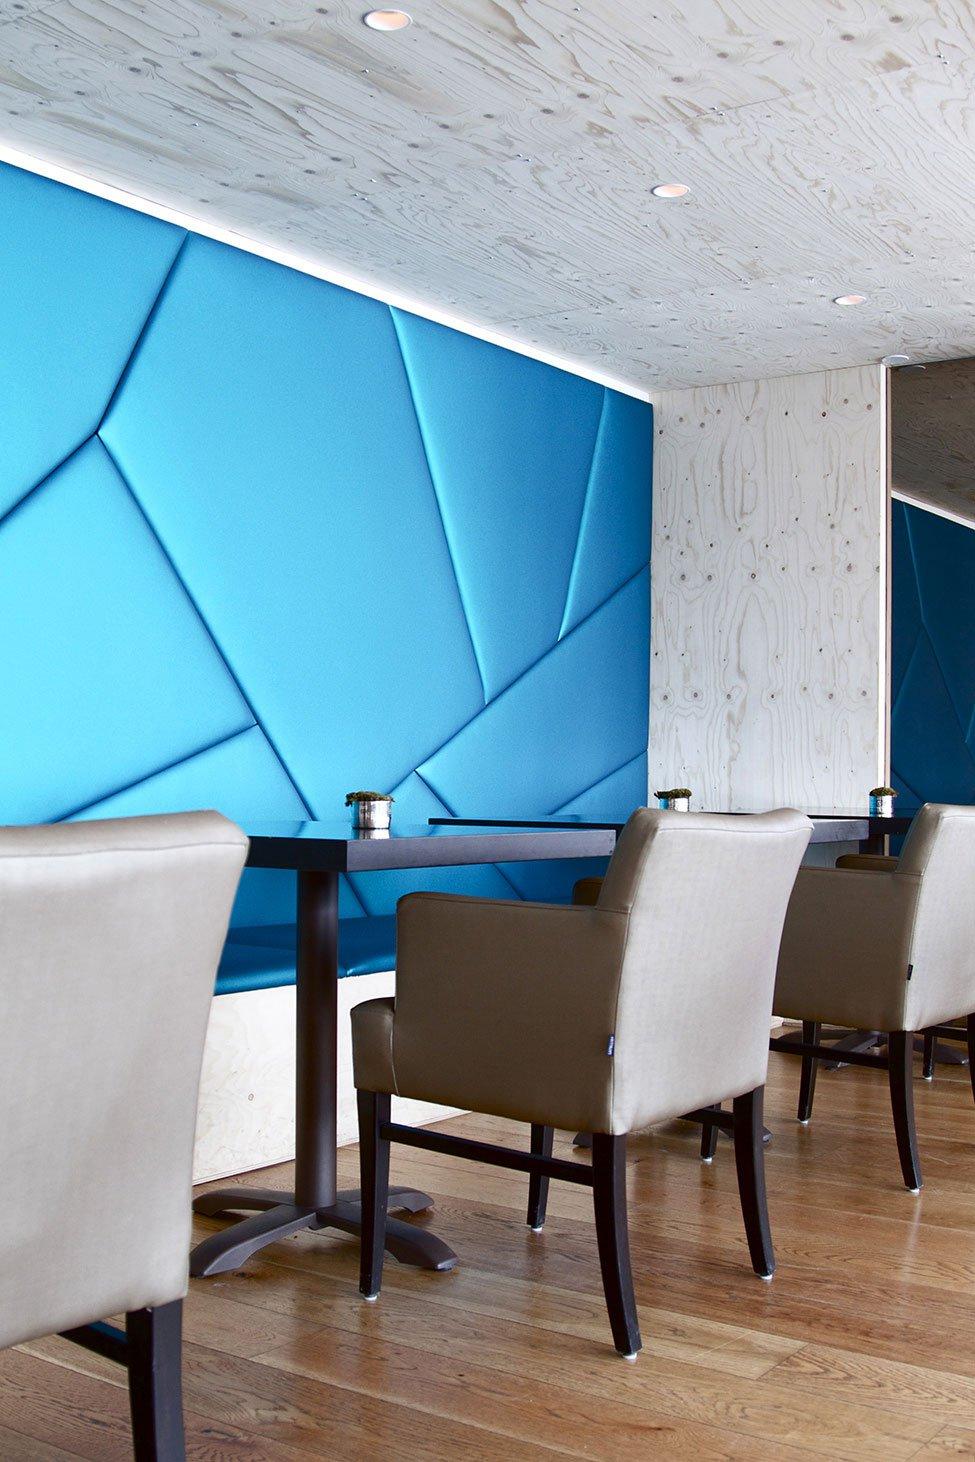 Ion-Luxury-Adventure-Hotel-26